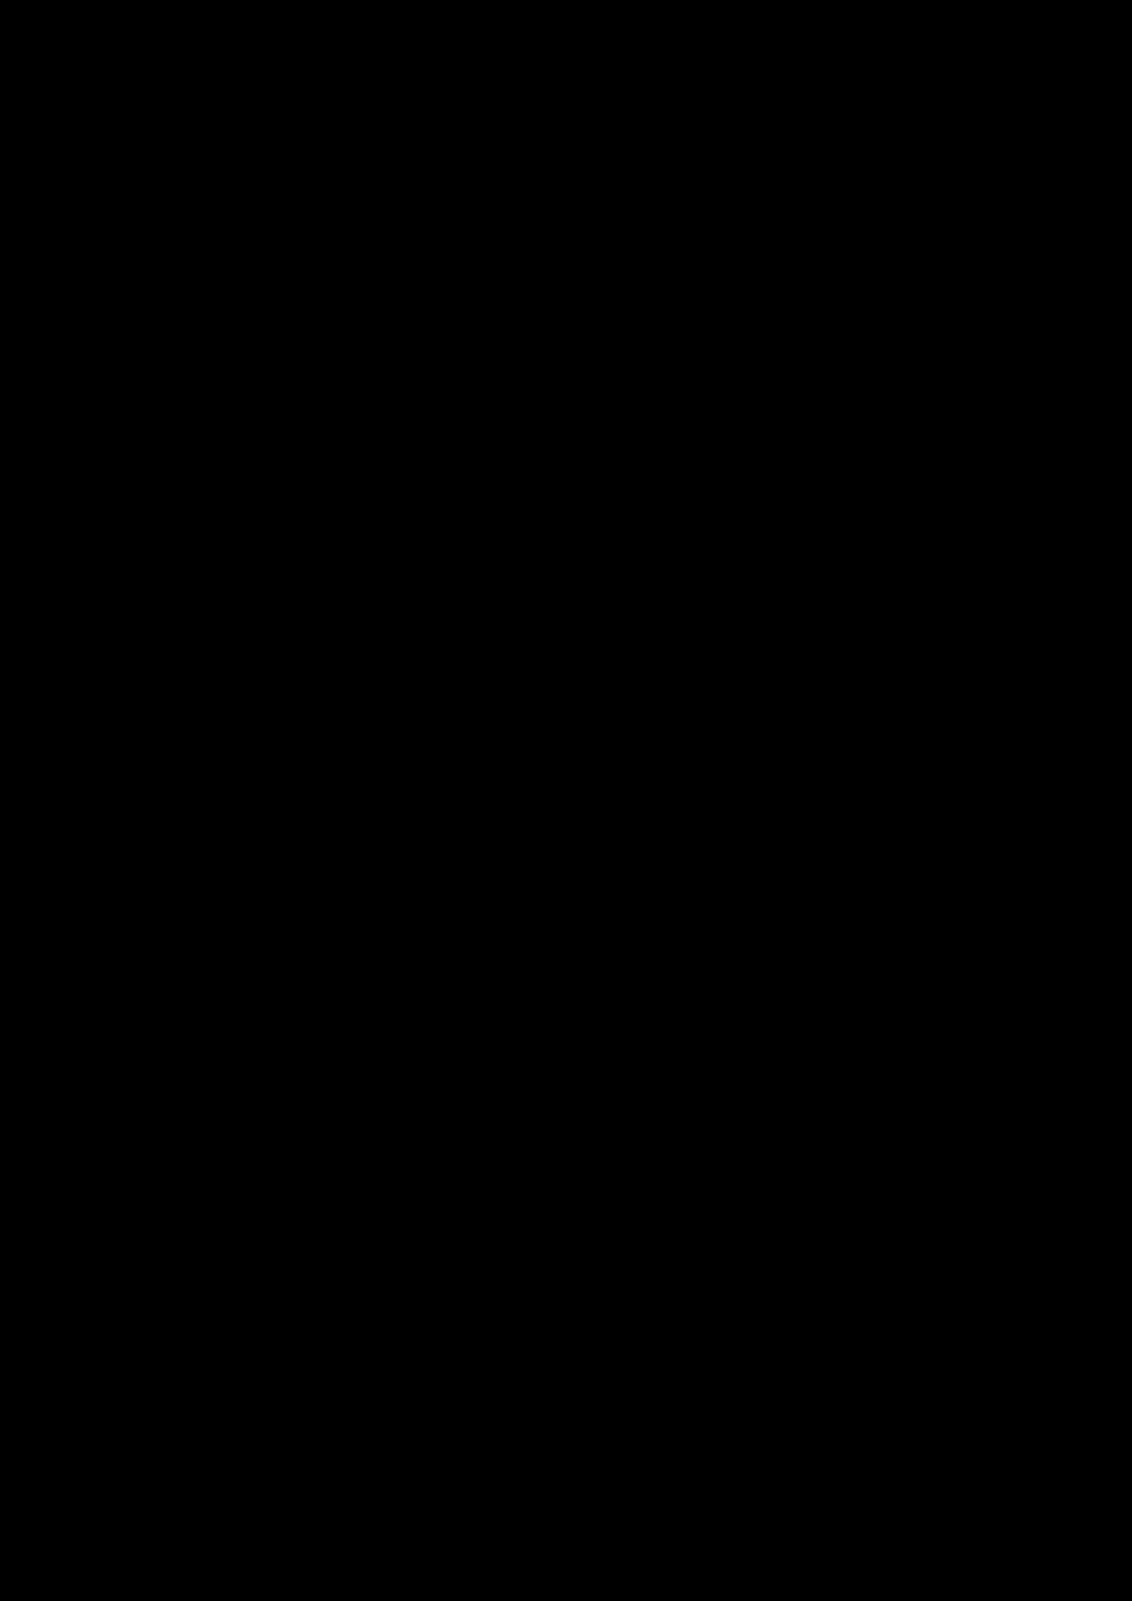 Belyiy sokol slide, Image 116